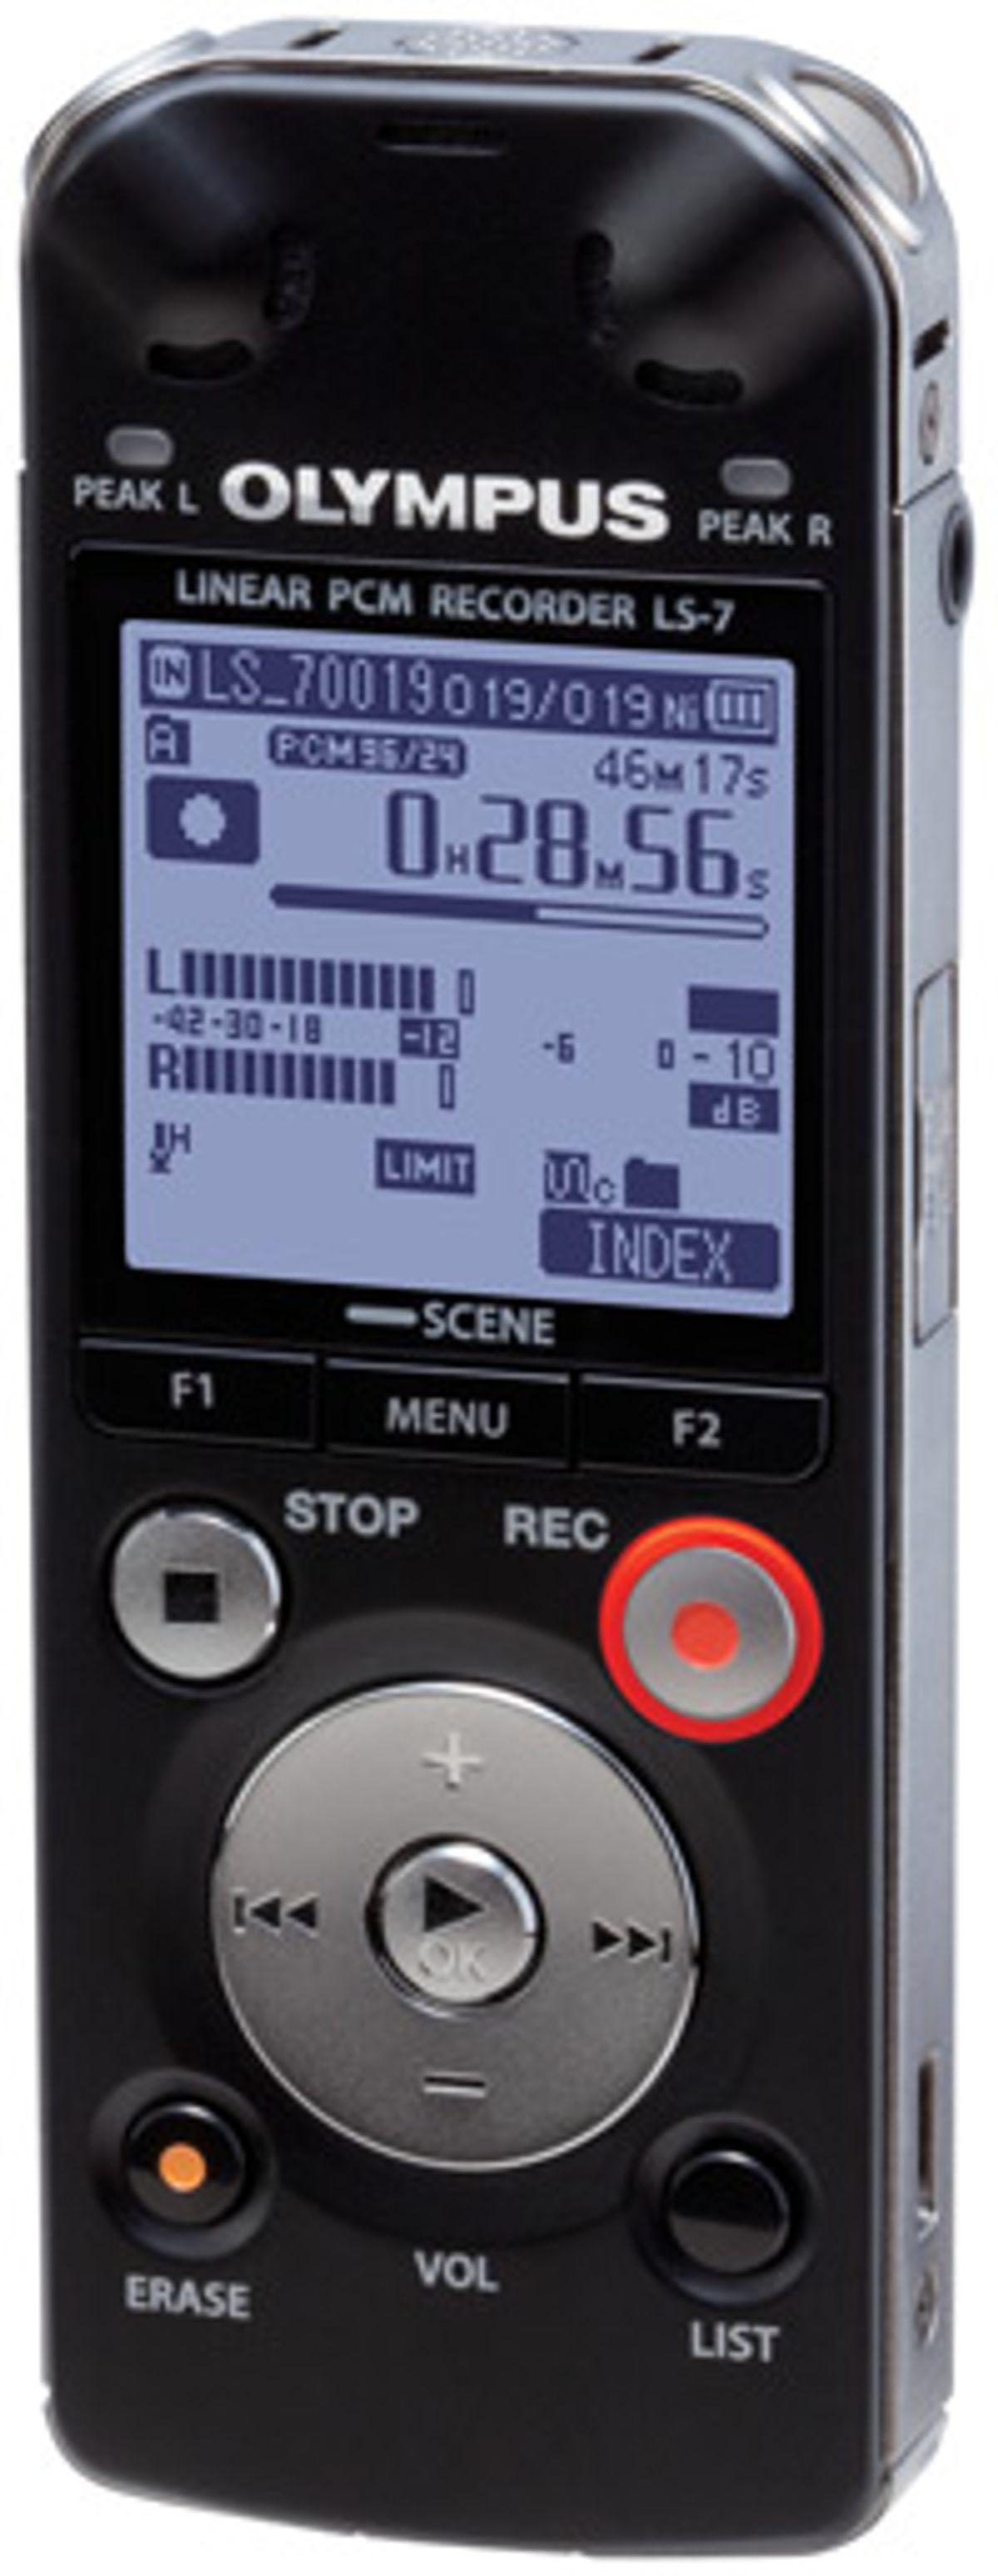 "Olympus Announces LS-7 ""Pocket"" Linear PCM Digital Recorder"